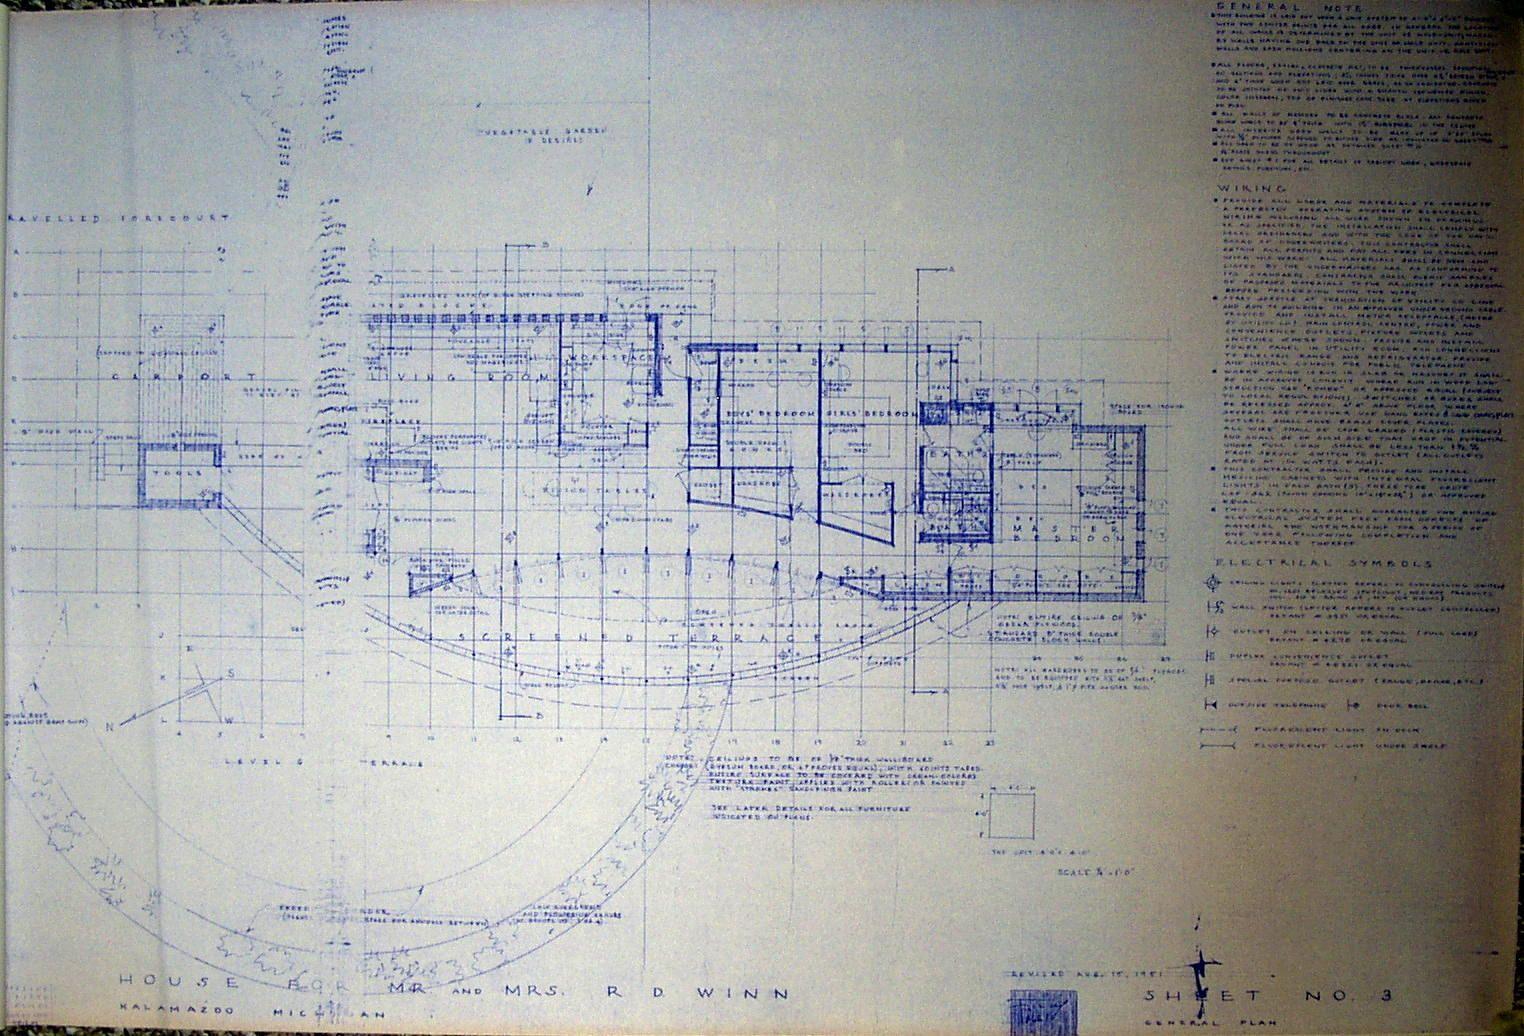 Frank Lloyd Wright Blueprints Google Search Frank Lloyd Wright Lloyd Wright Construction Drawings